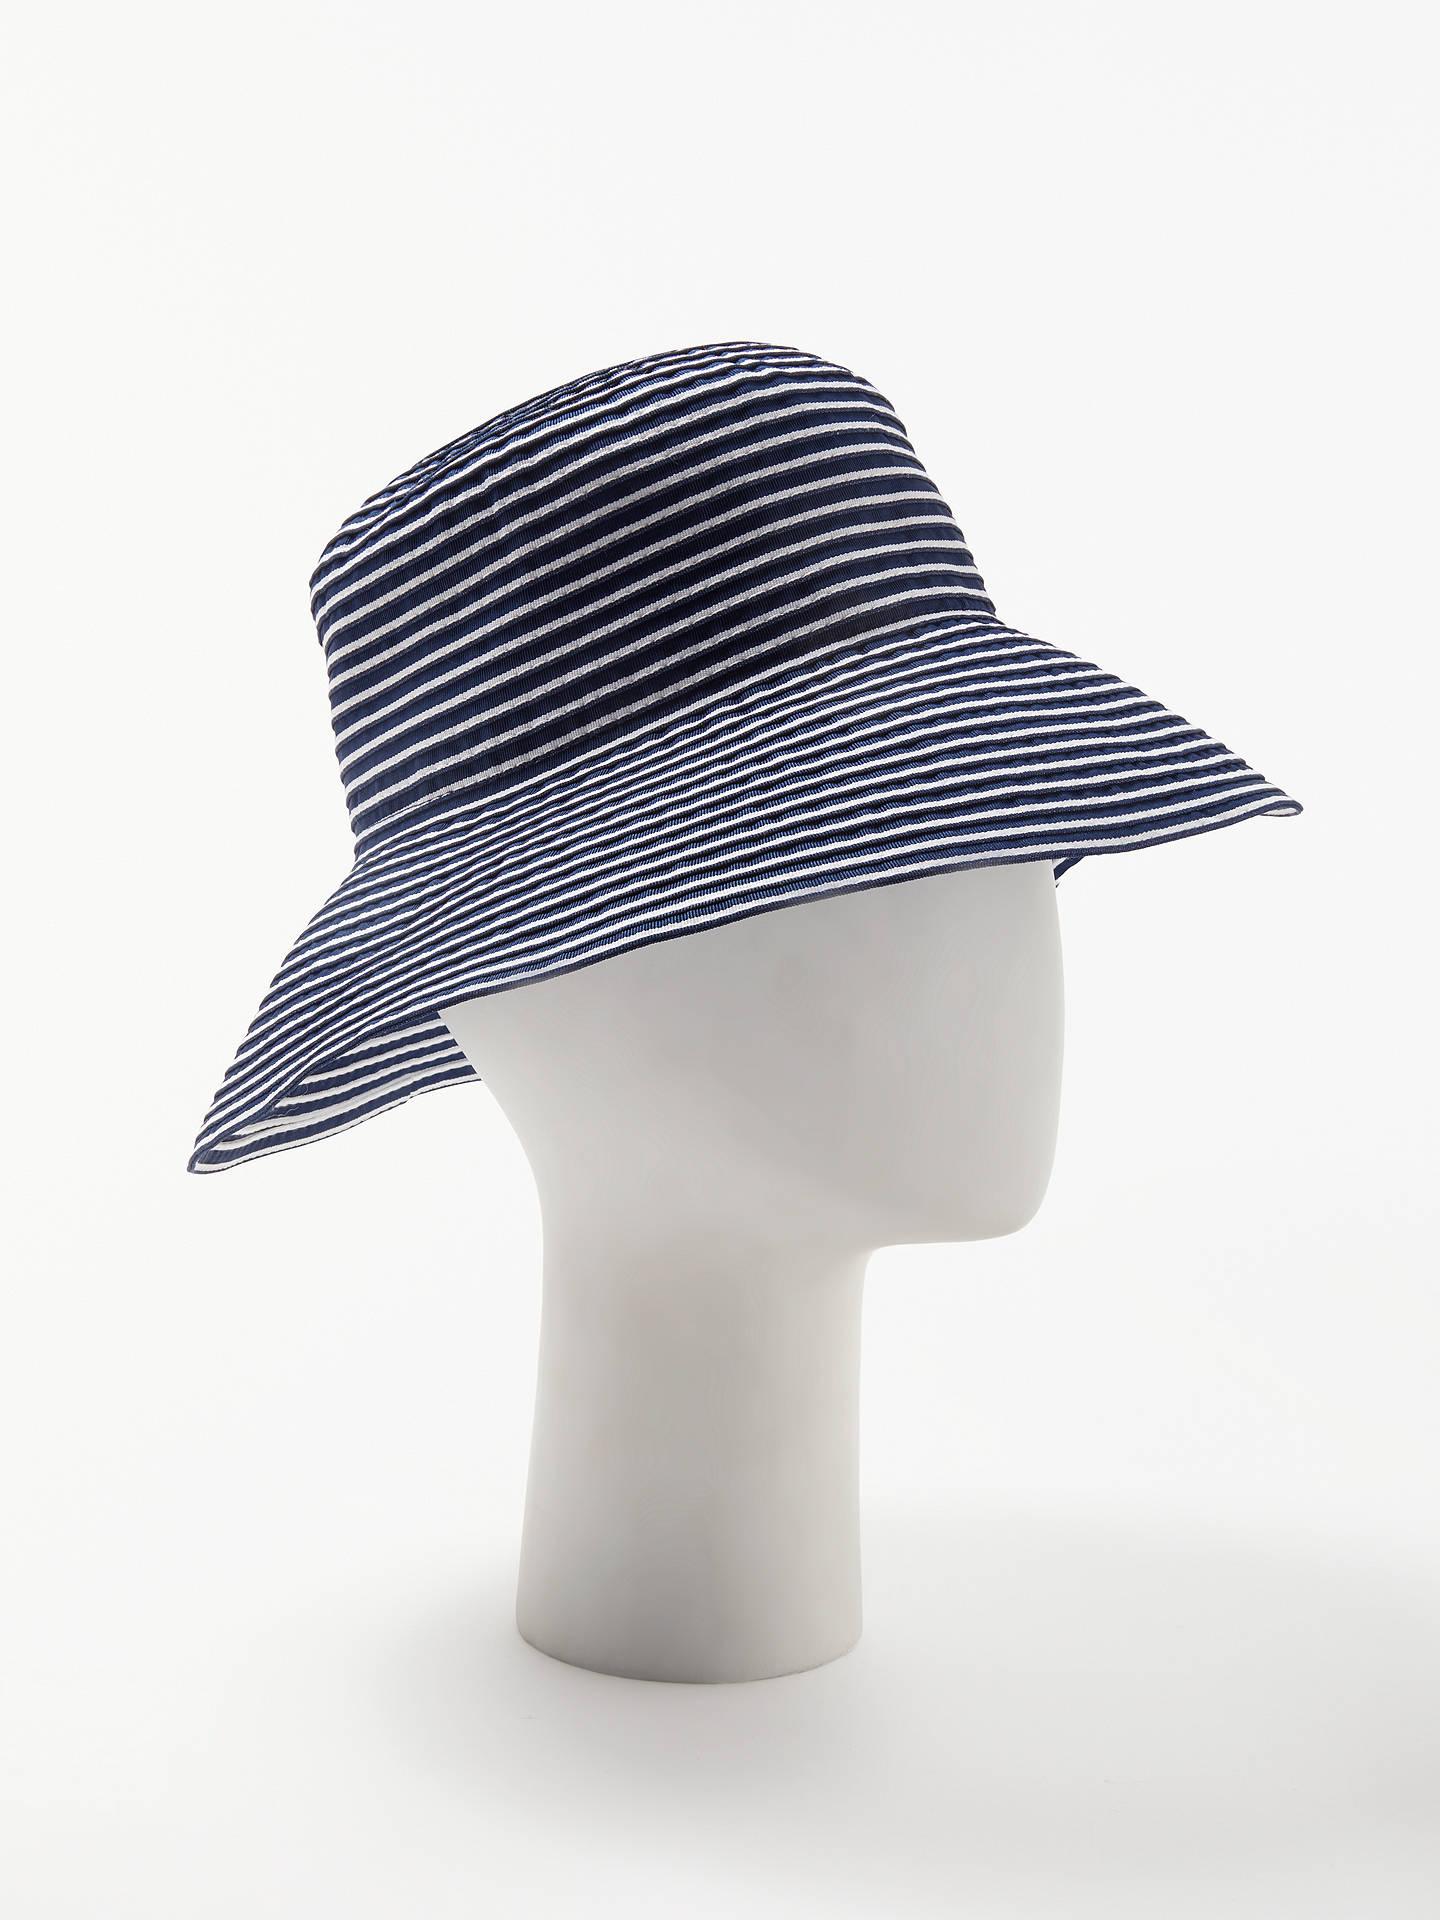 e87e807ed5a15 ... france buyjohn lewis packable stripe floppy sun hat navy white online  at johnlewis 04a66 c53fb